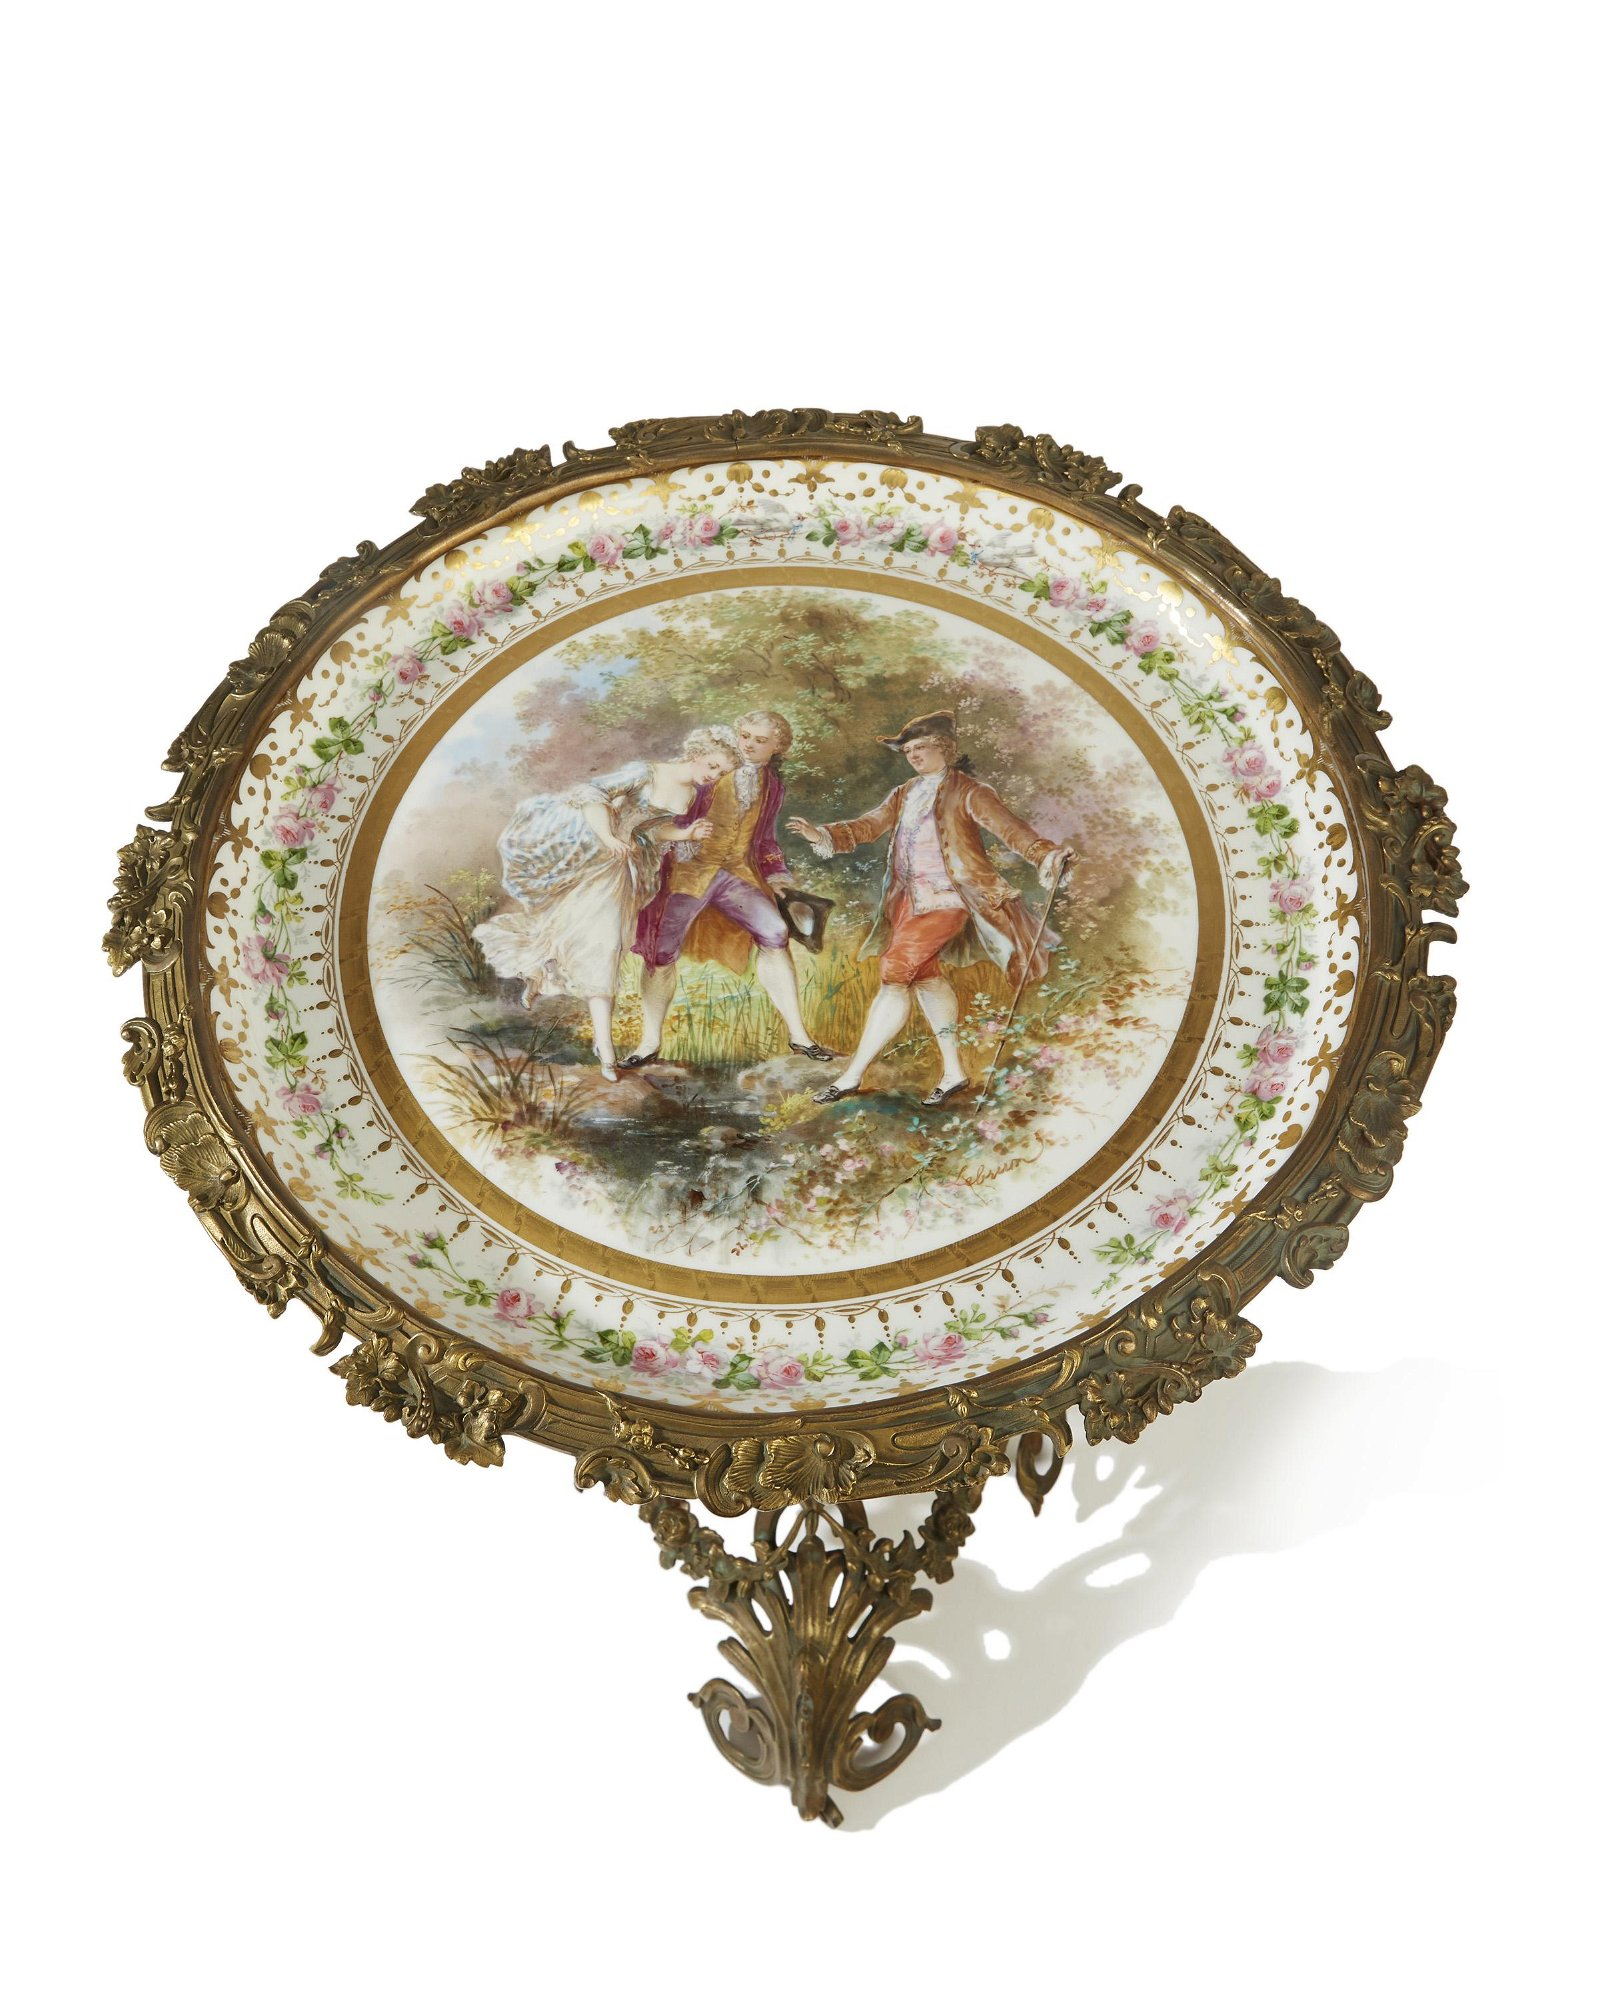 A gilt bronze-mounted Sèvres porcelain side